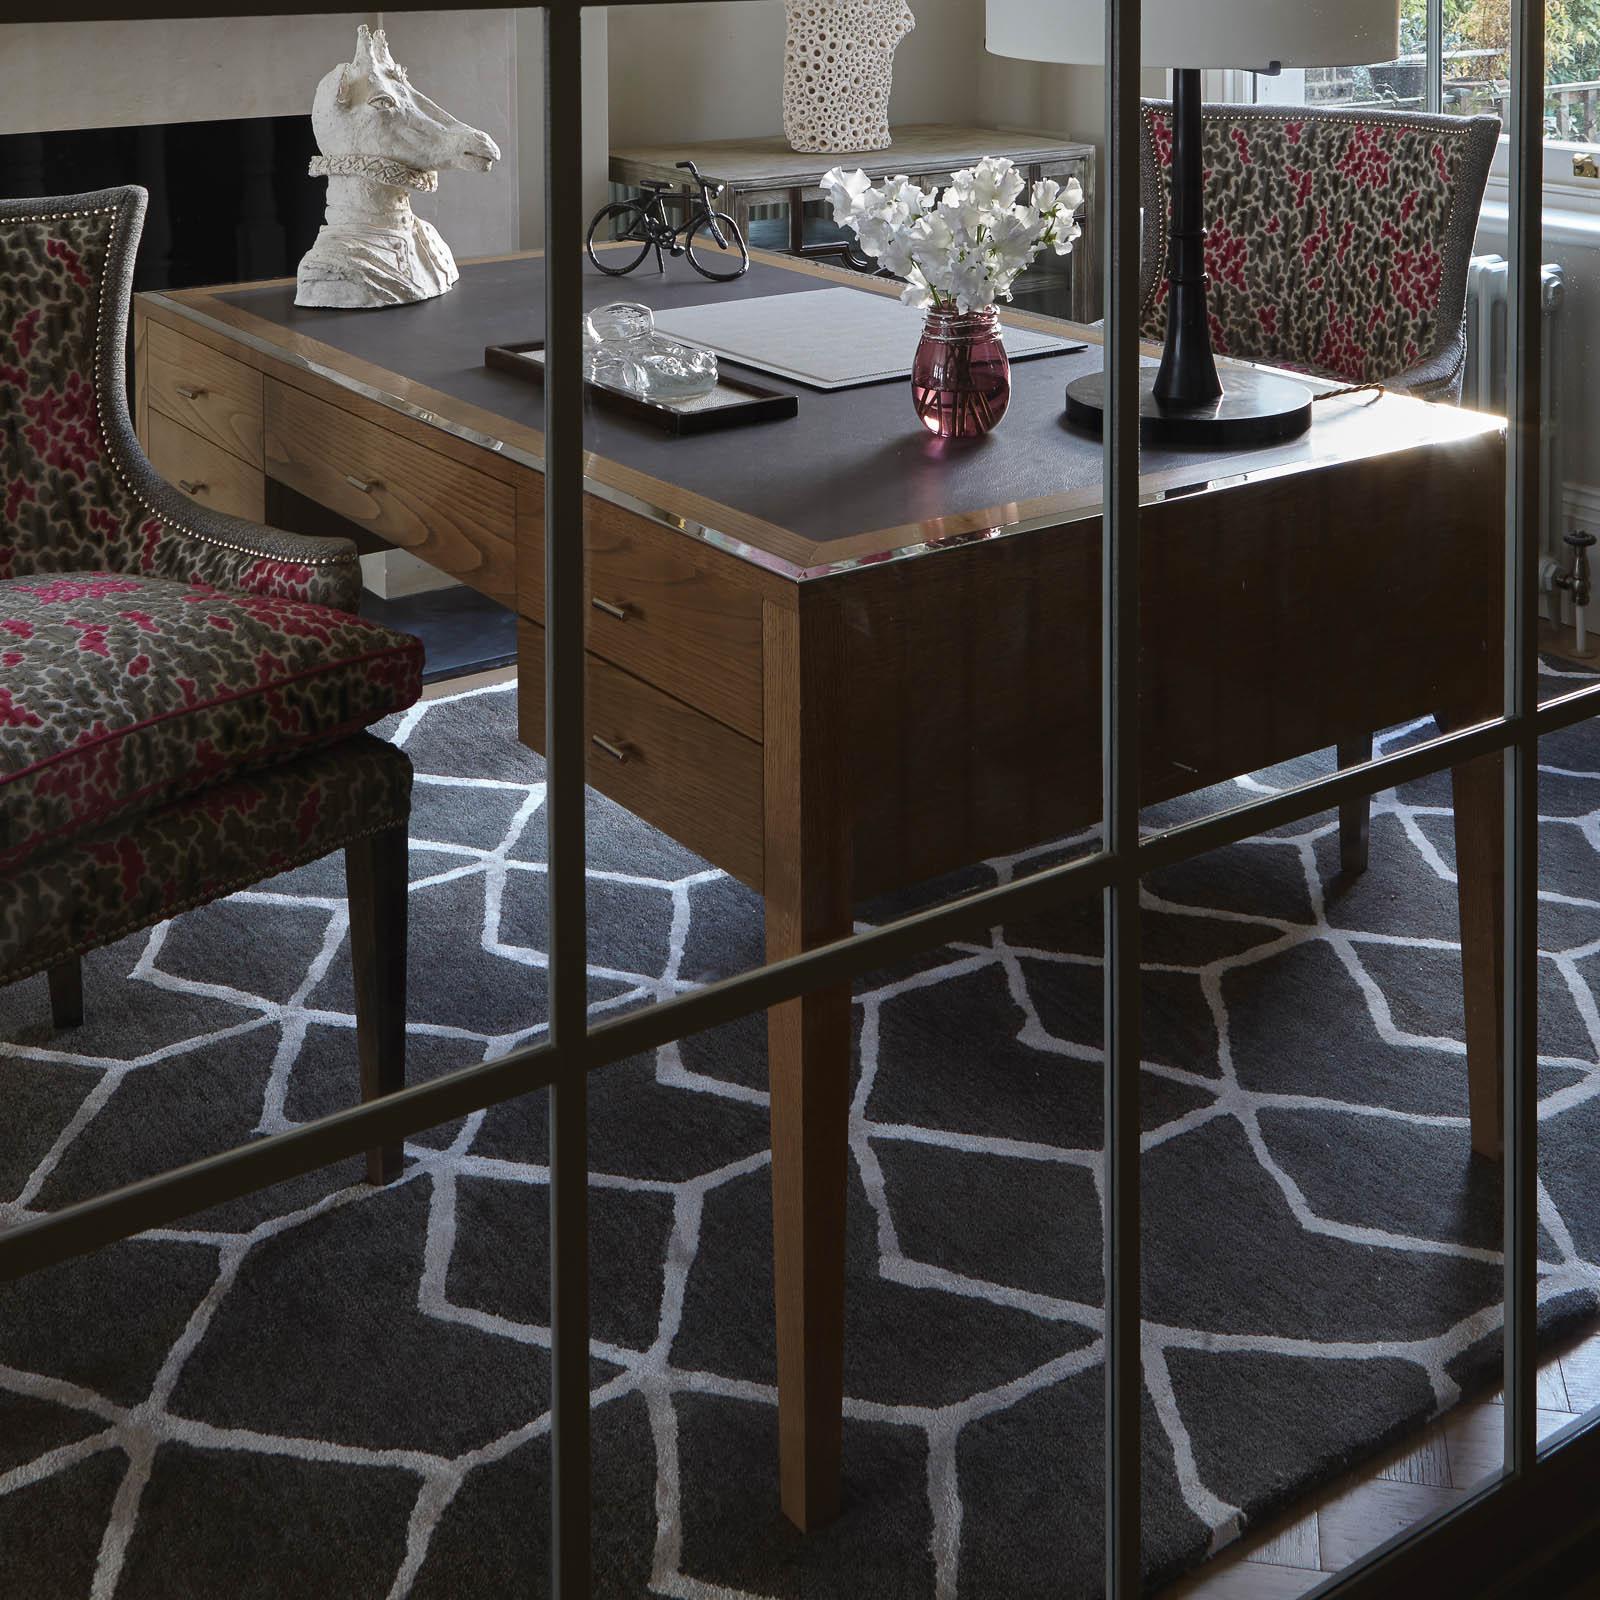 Venezia rugs in Slate by William Yeoward